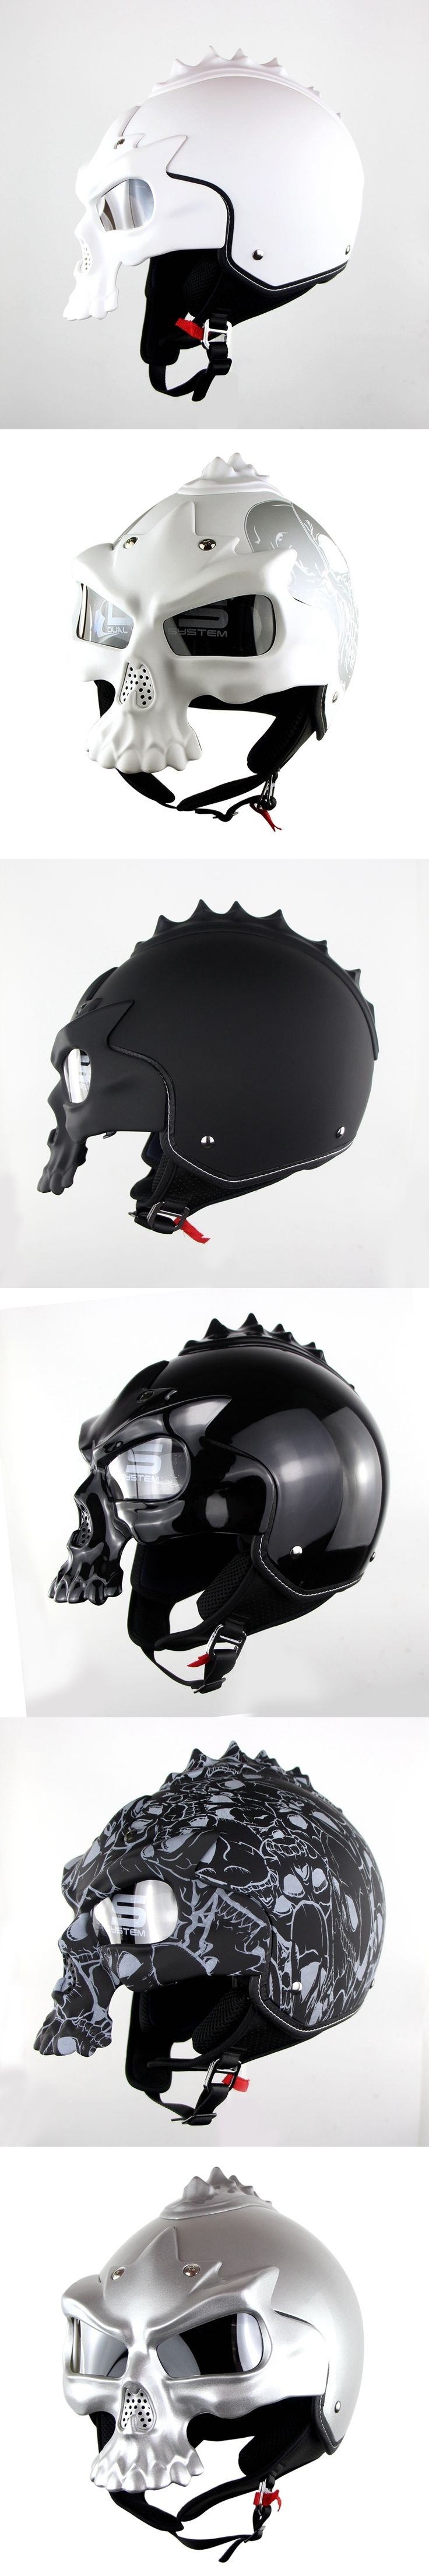 100% Original High Quality Double Lens Motorcycle Skull Helmets Half Face Harley Helmet Motorbike Capacetes Casco Retro Casque